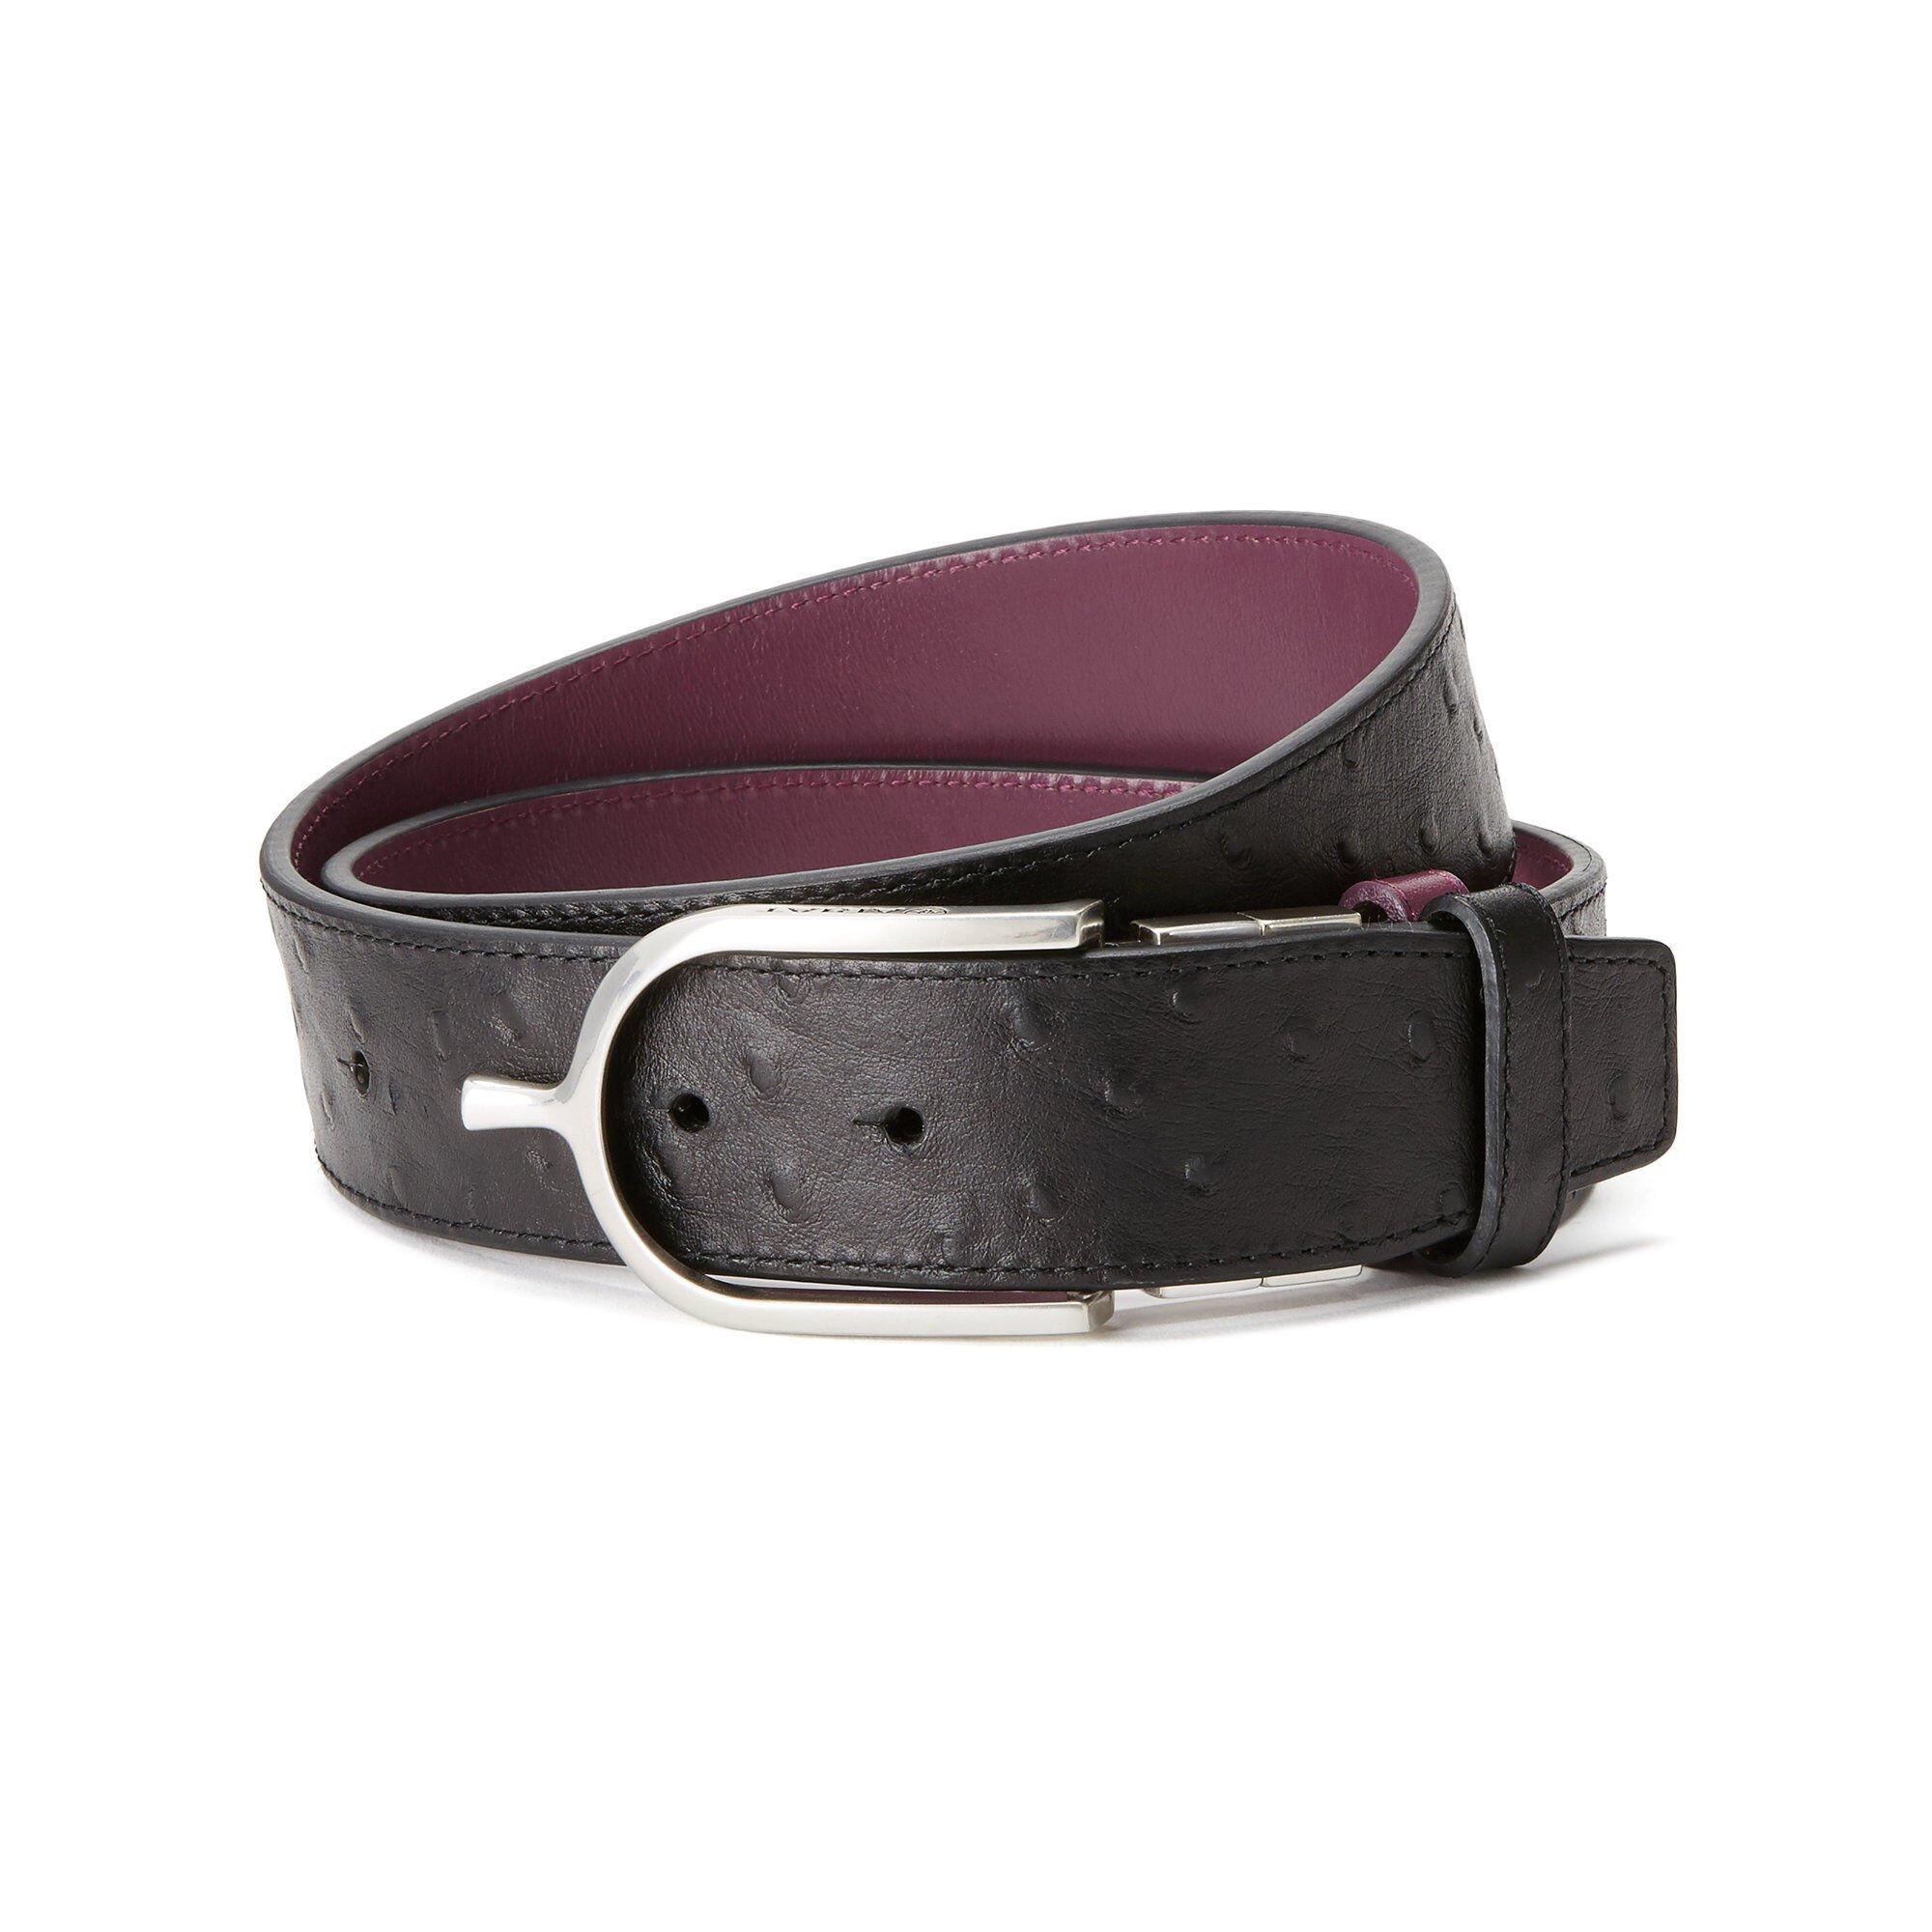 Radiant Reversible Belt